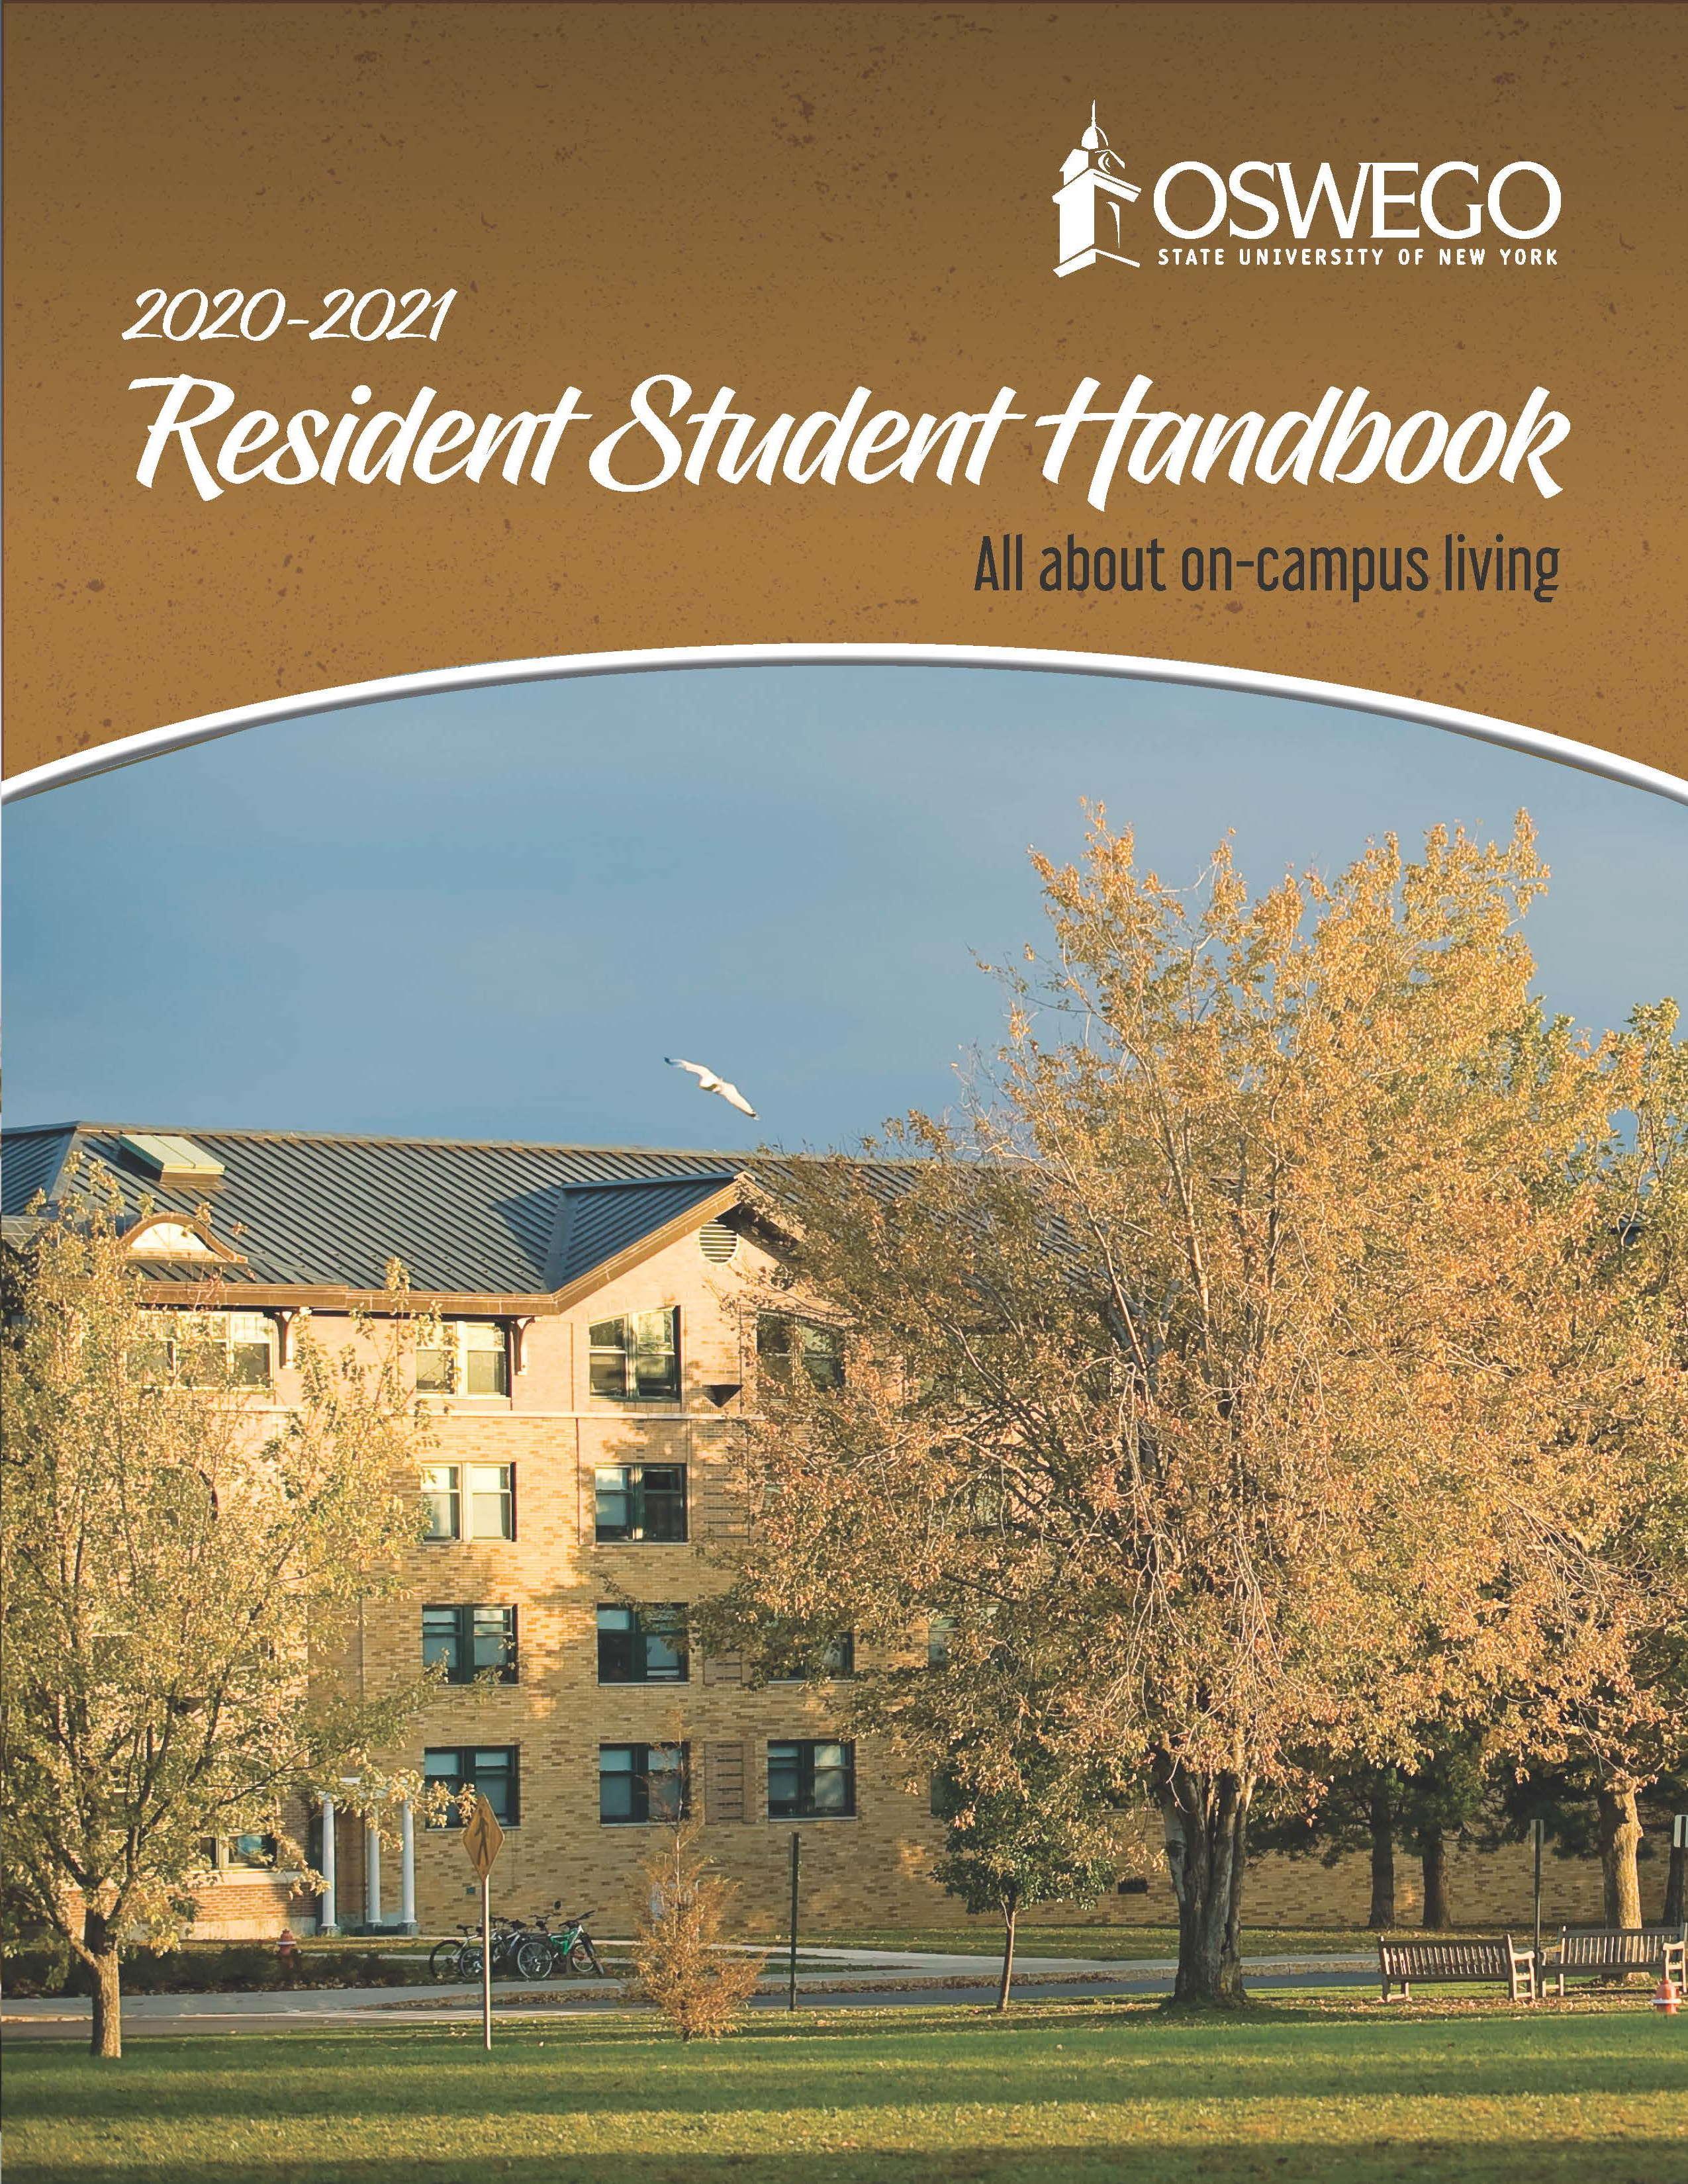 Residence Life Handbook Cover